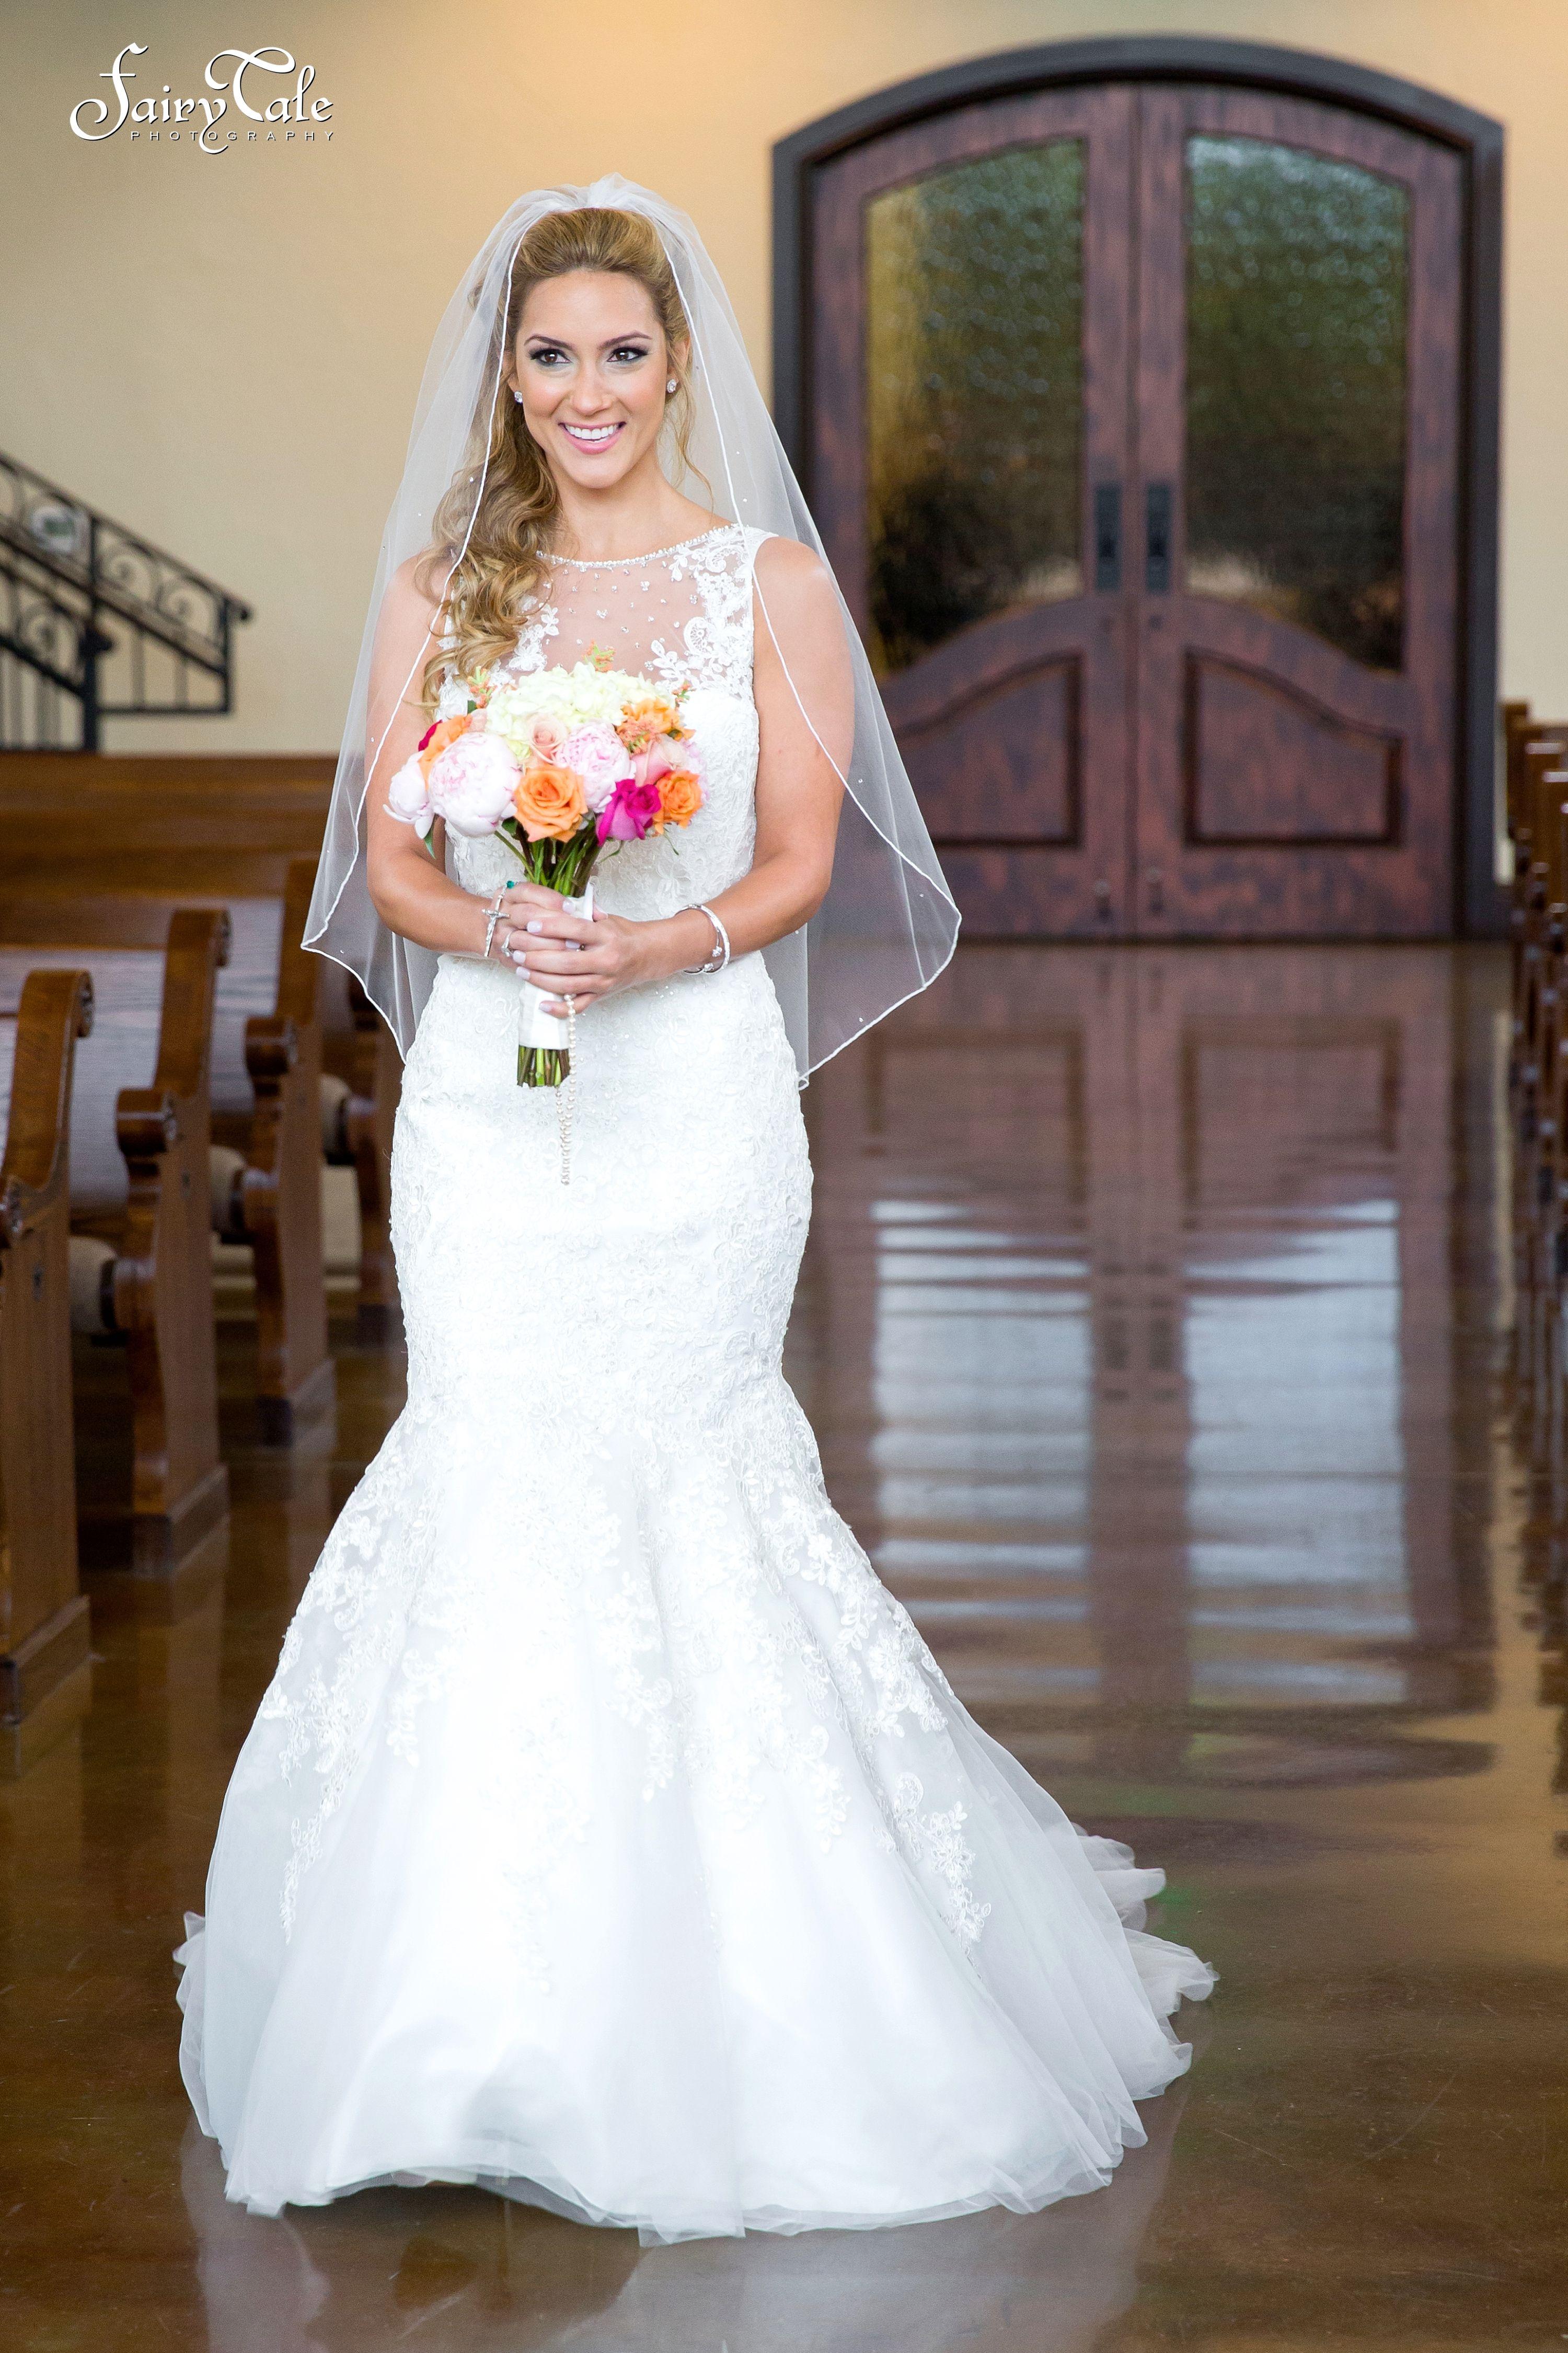 After wedding dress ideas  Wedding dress idea  Fairy Tale Photography  Wedding Dresses